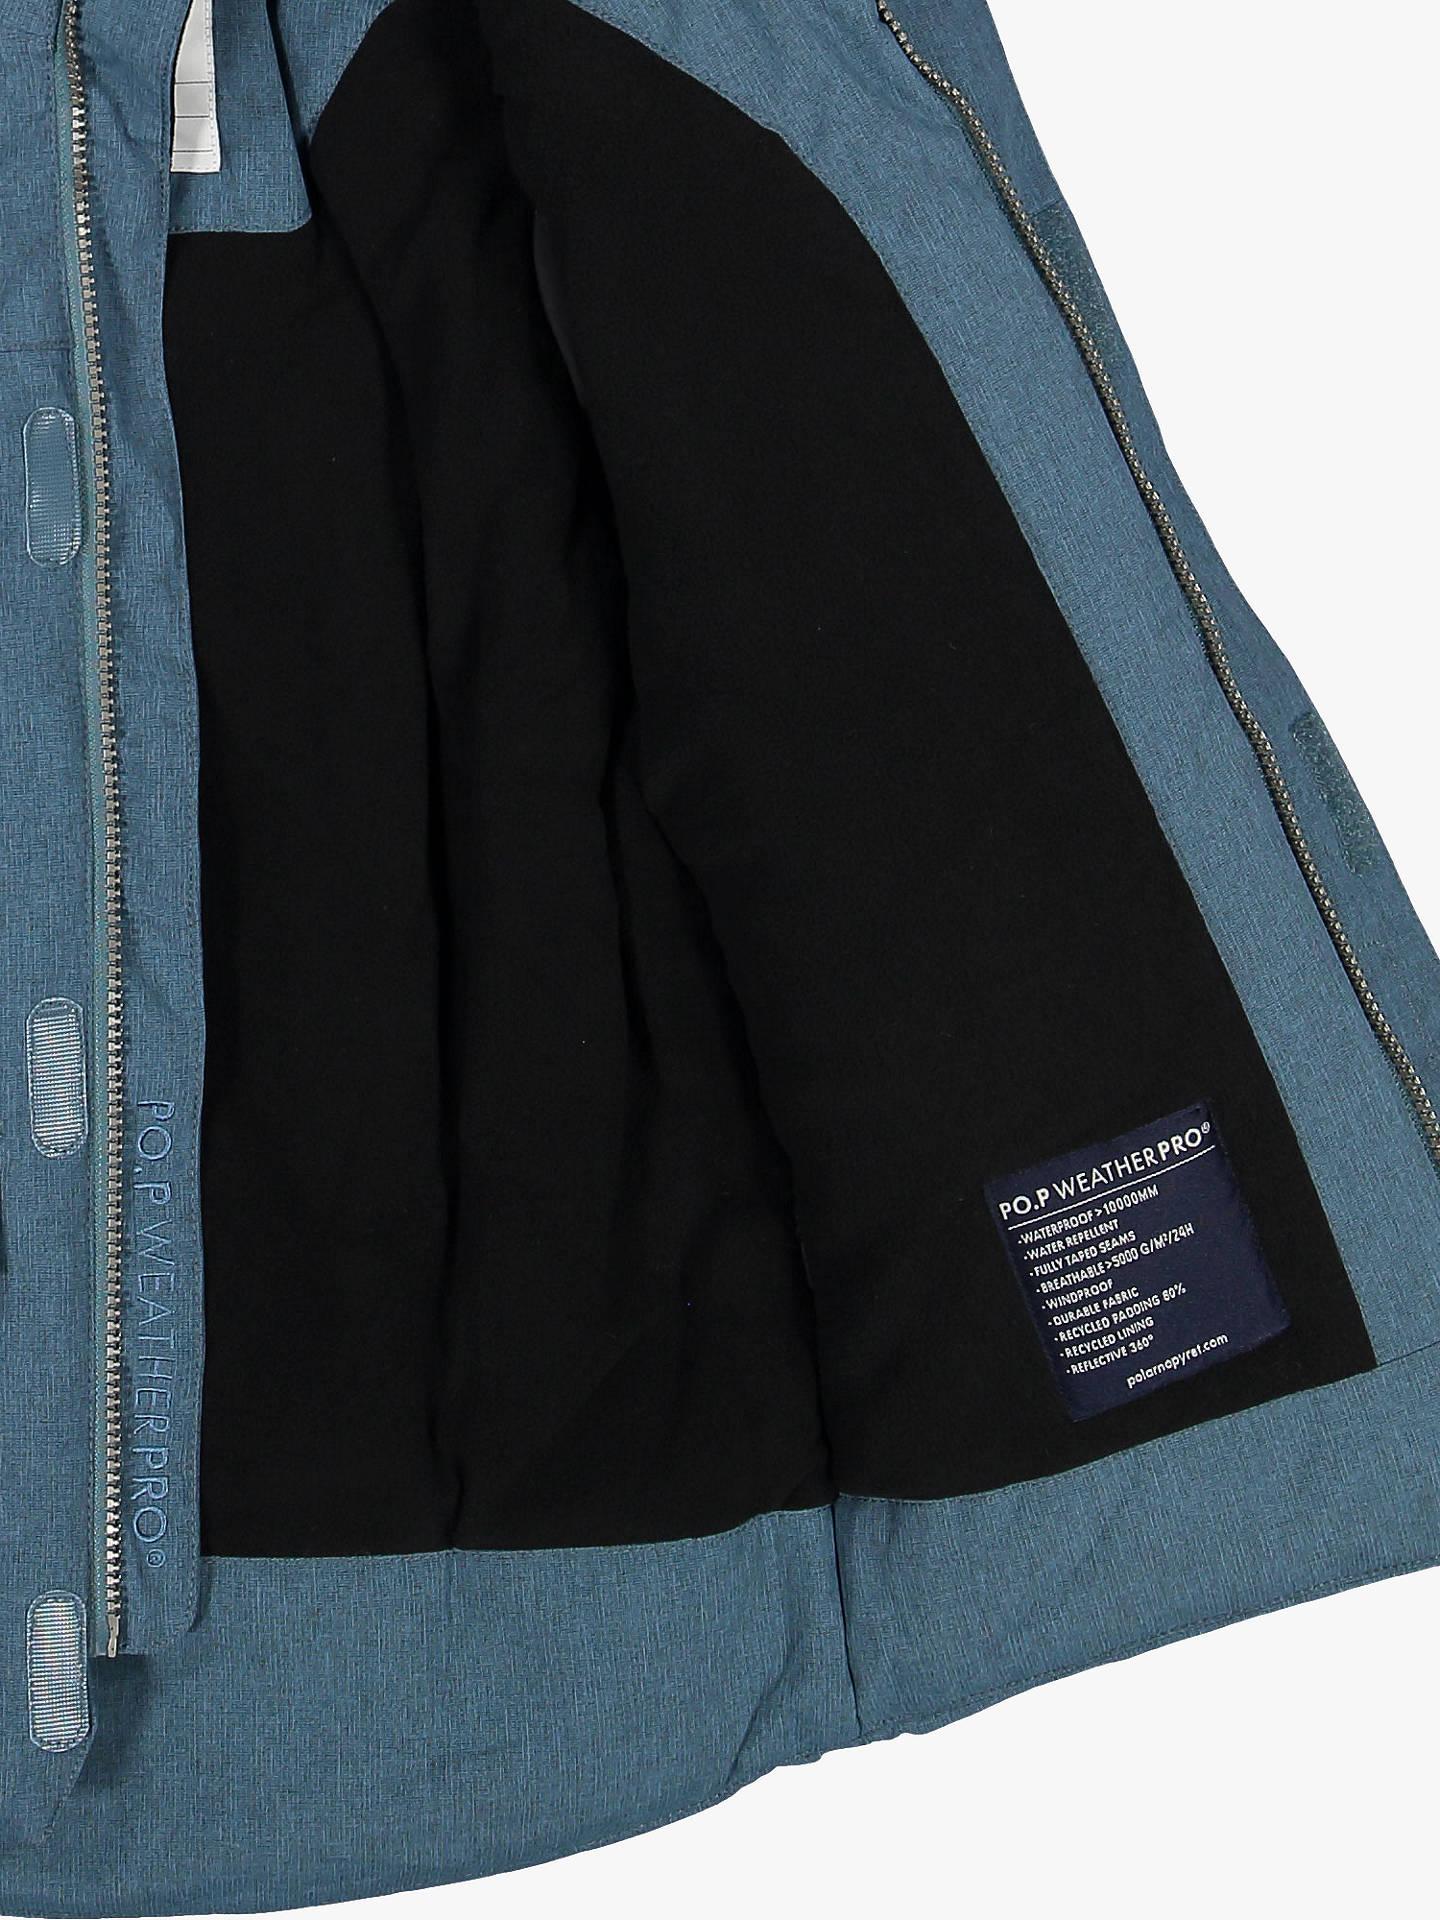 Polarn O. Pyret Children's Parka Coat, Storm Blue